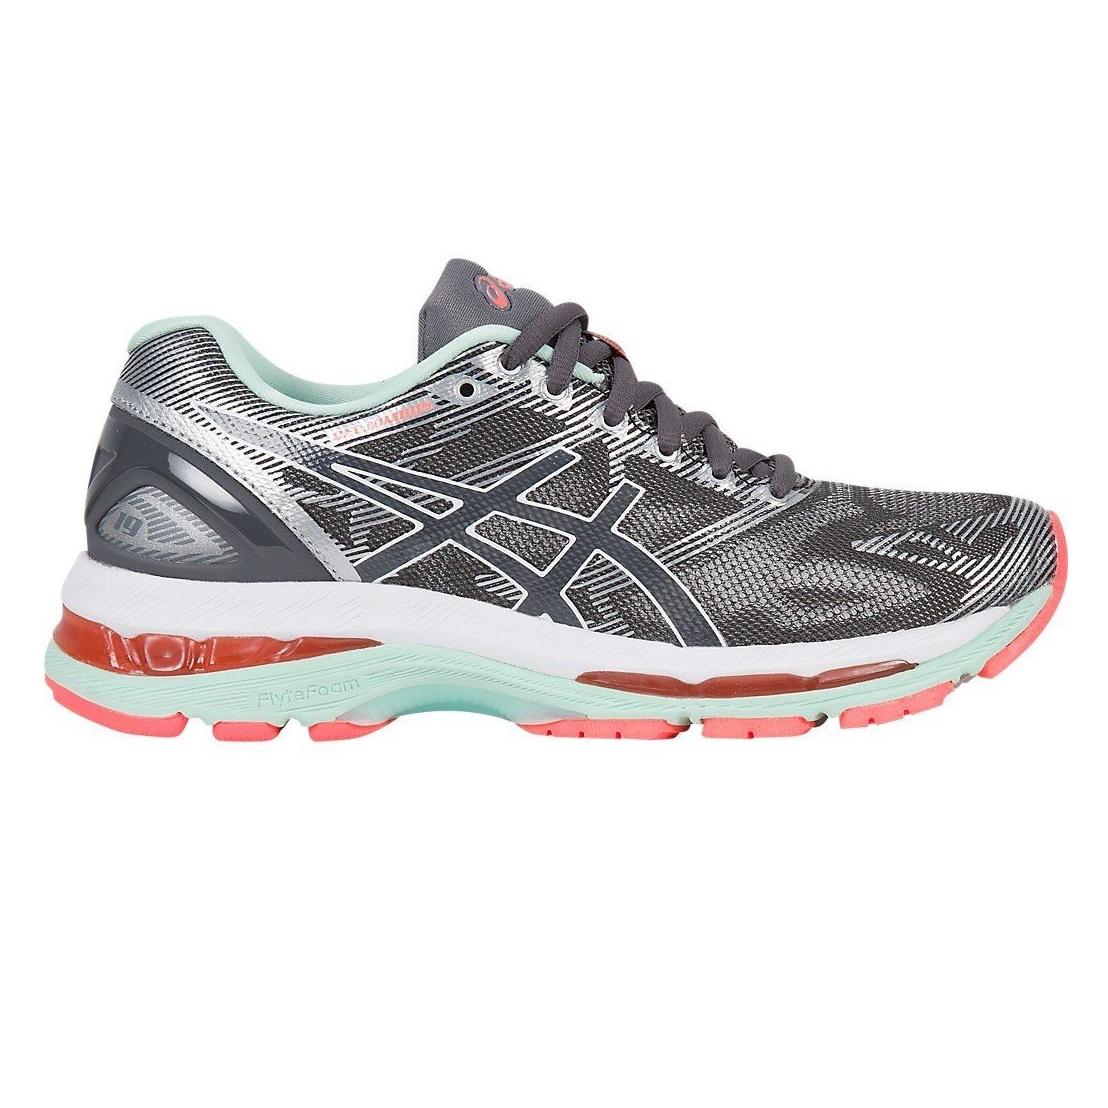 separation shoes 901cf 80467 ASICS 亚瑟士GEL-Nimbus 19 女士顶级缓震跑步鞋$49.99 - 北美找丢网